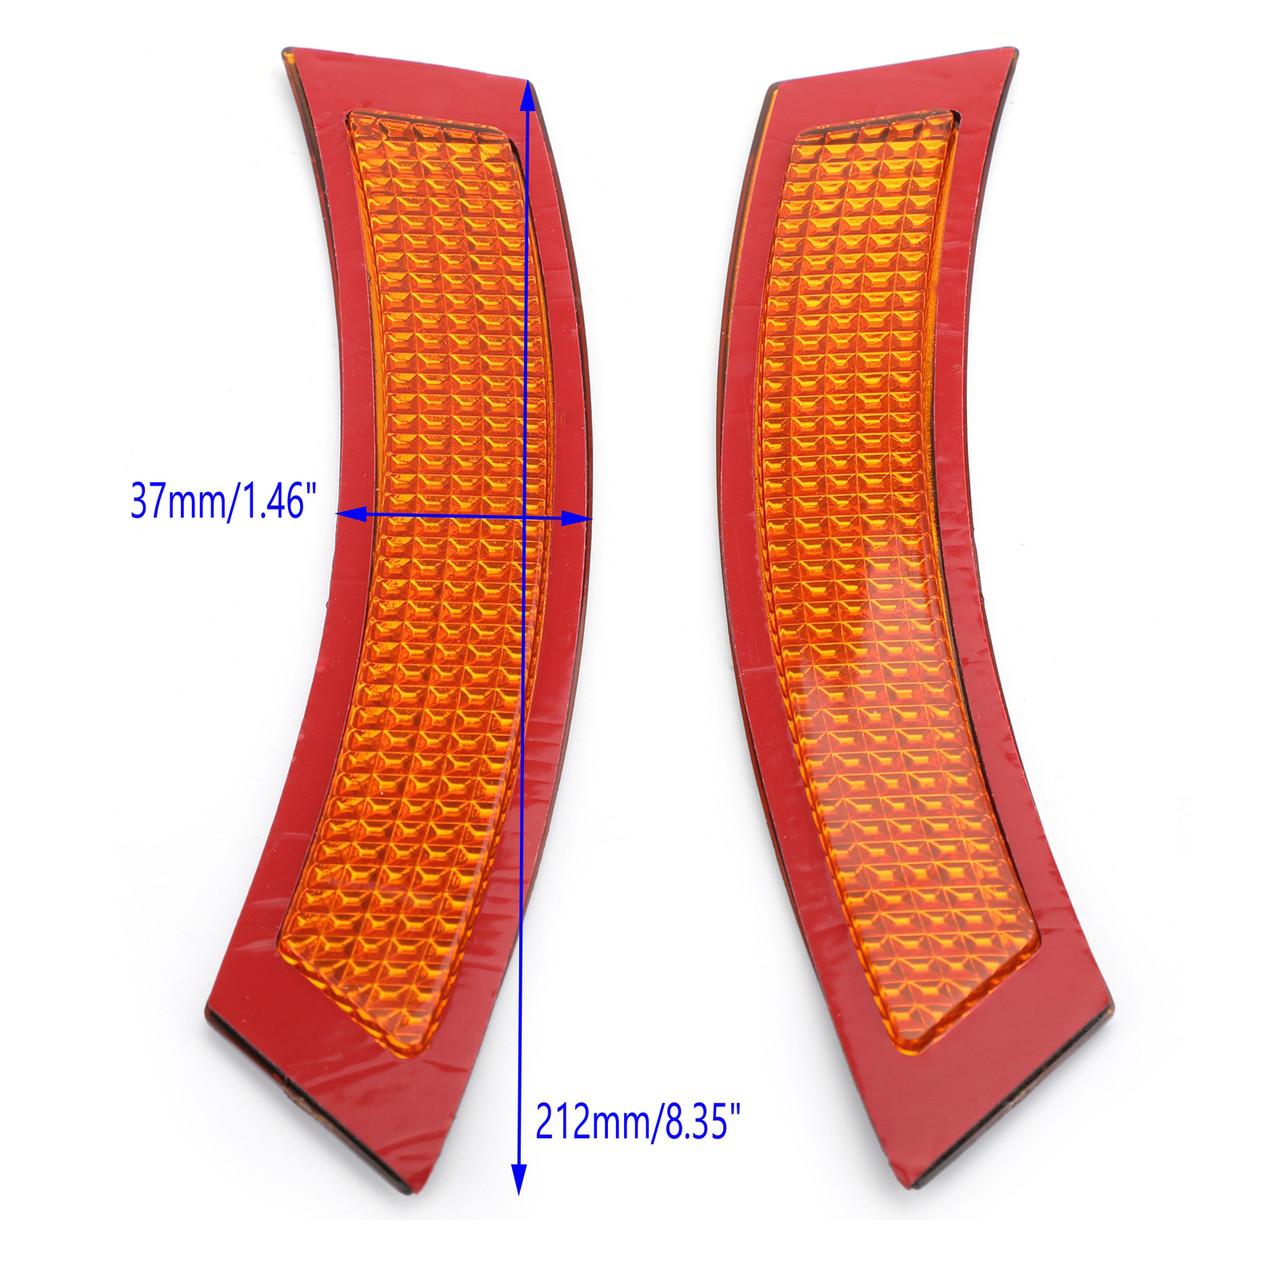 Overun Front Side Marker Fender Bumper Replacement Reflector Amber Lens Designed for 2007-2013 E92 E93 2DR